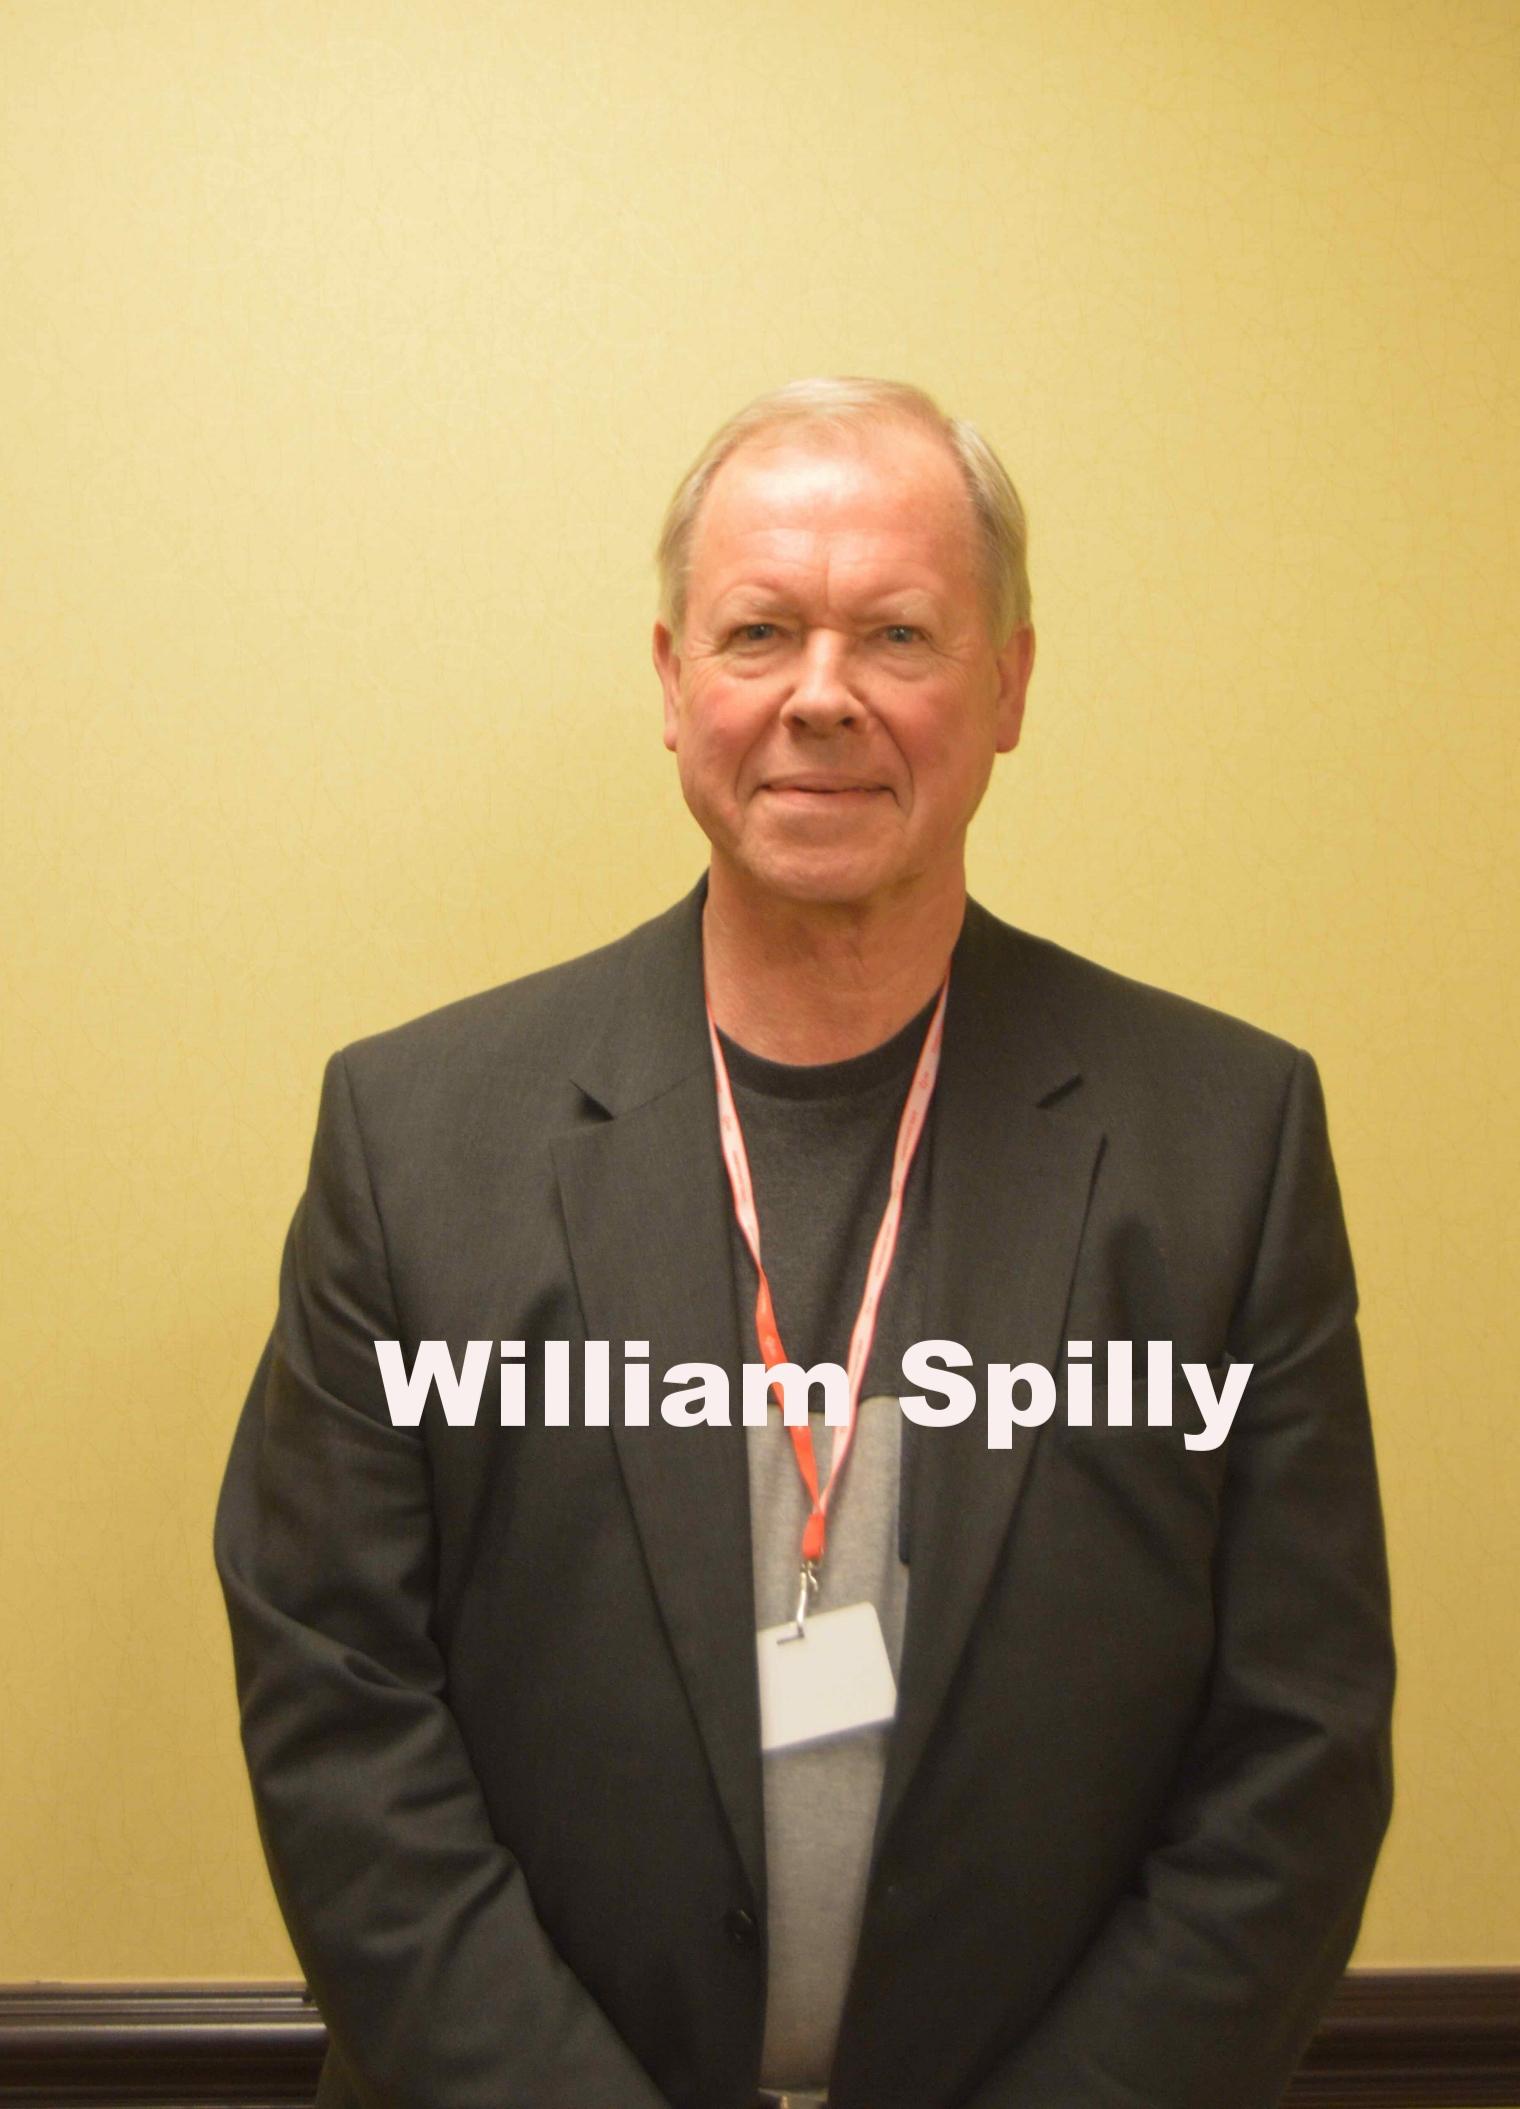 BillSpilly.jpg